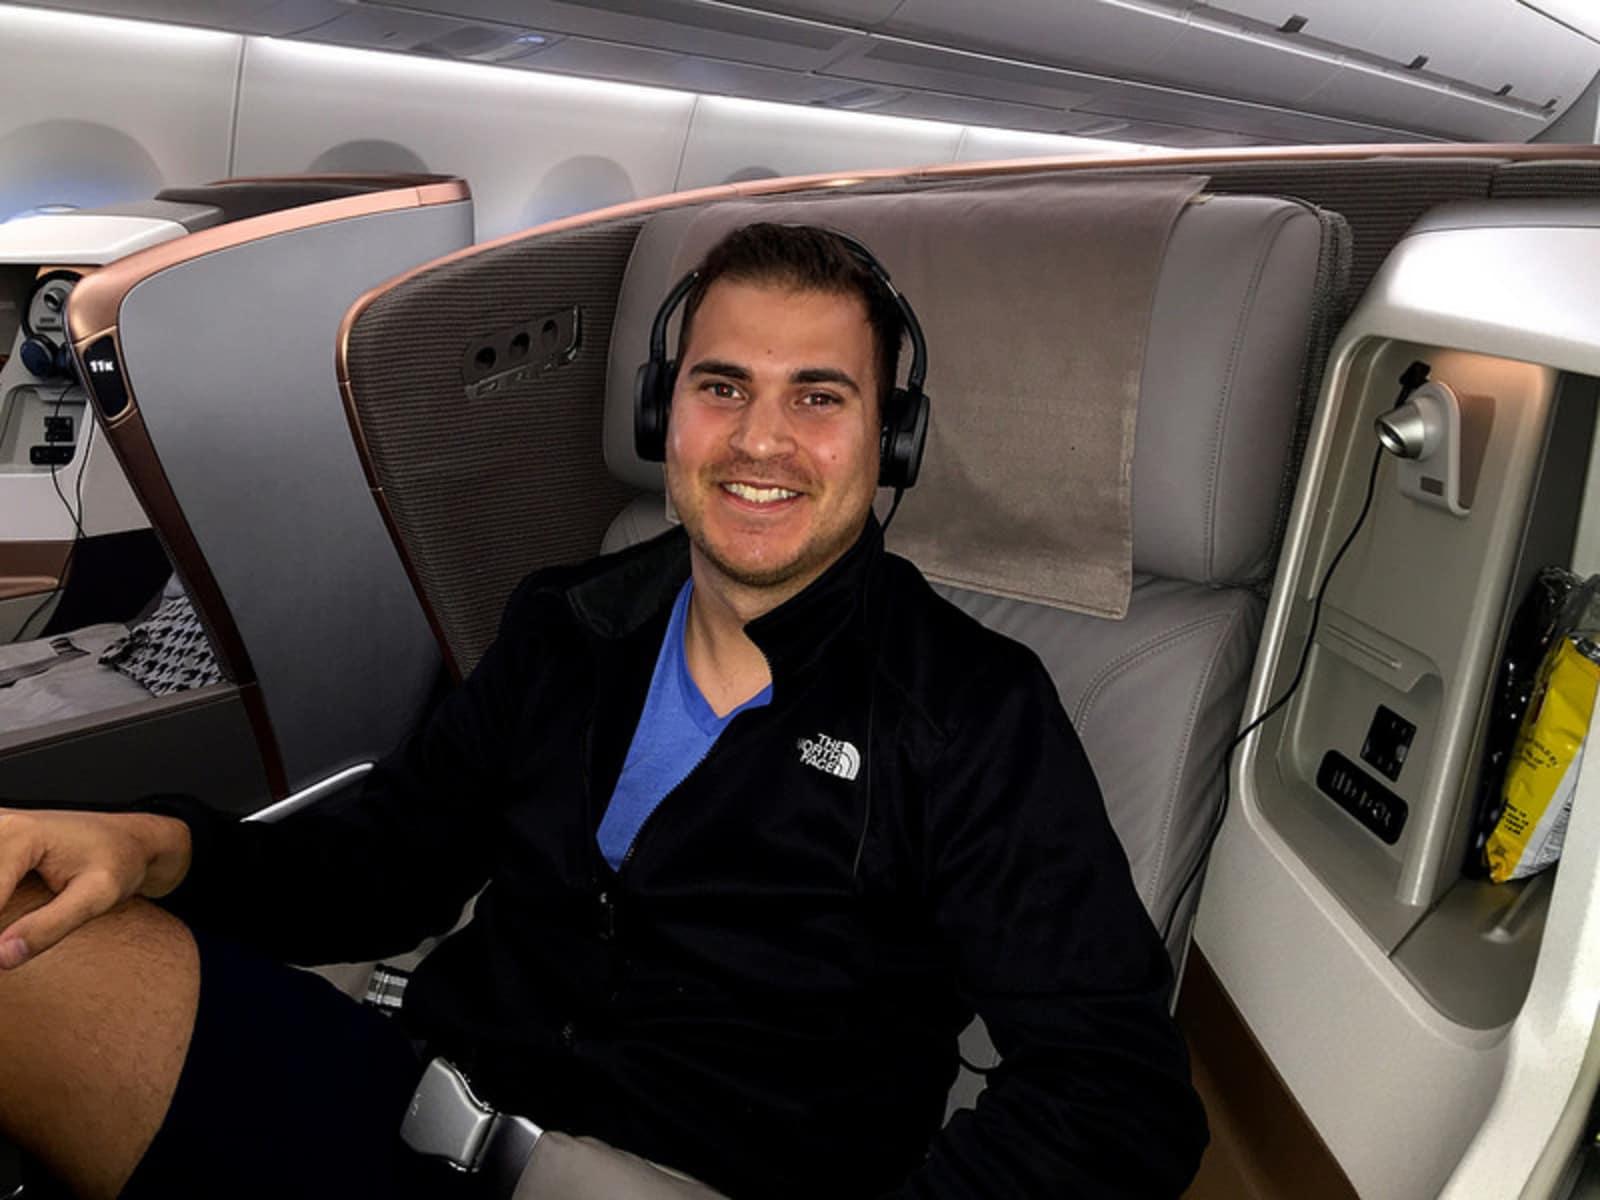 Gillaspia's business class flight to Johannesburg